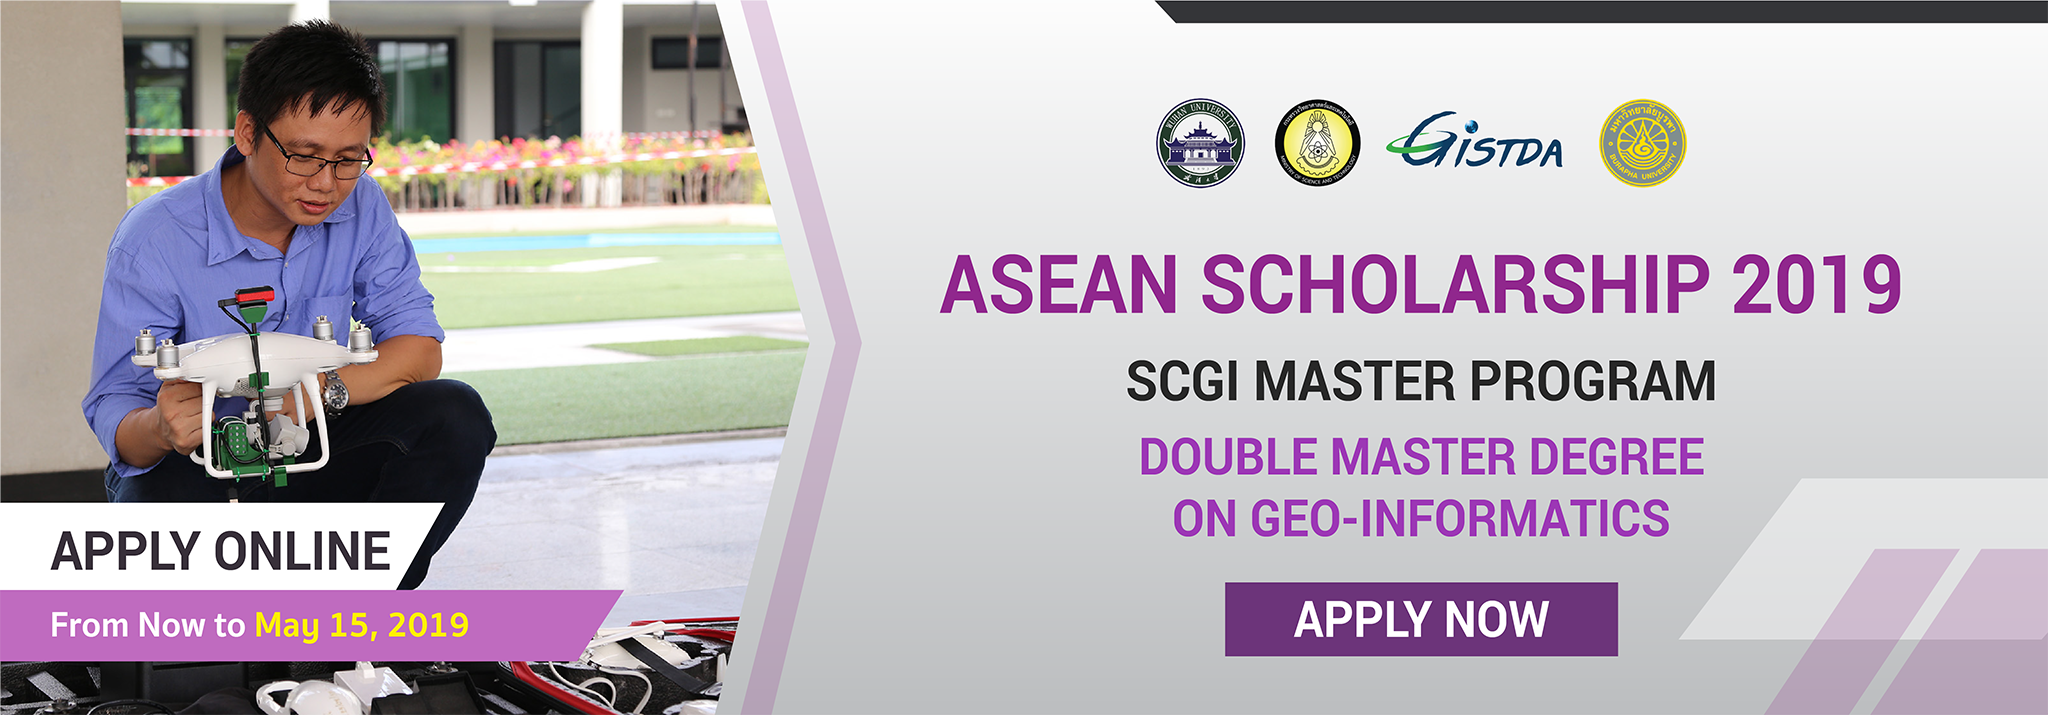 Asean scholarship 2019